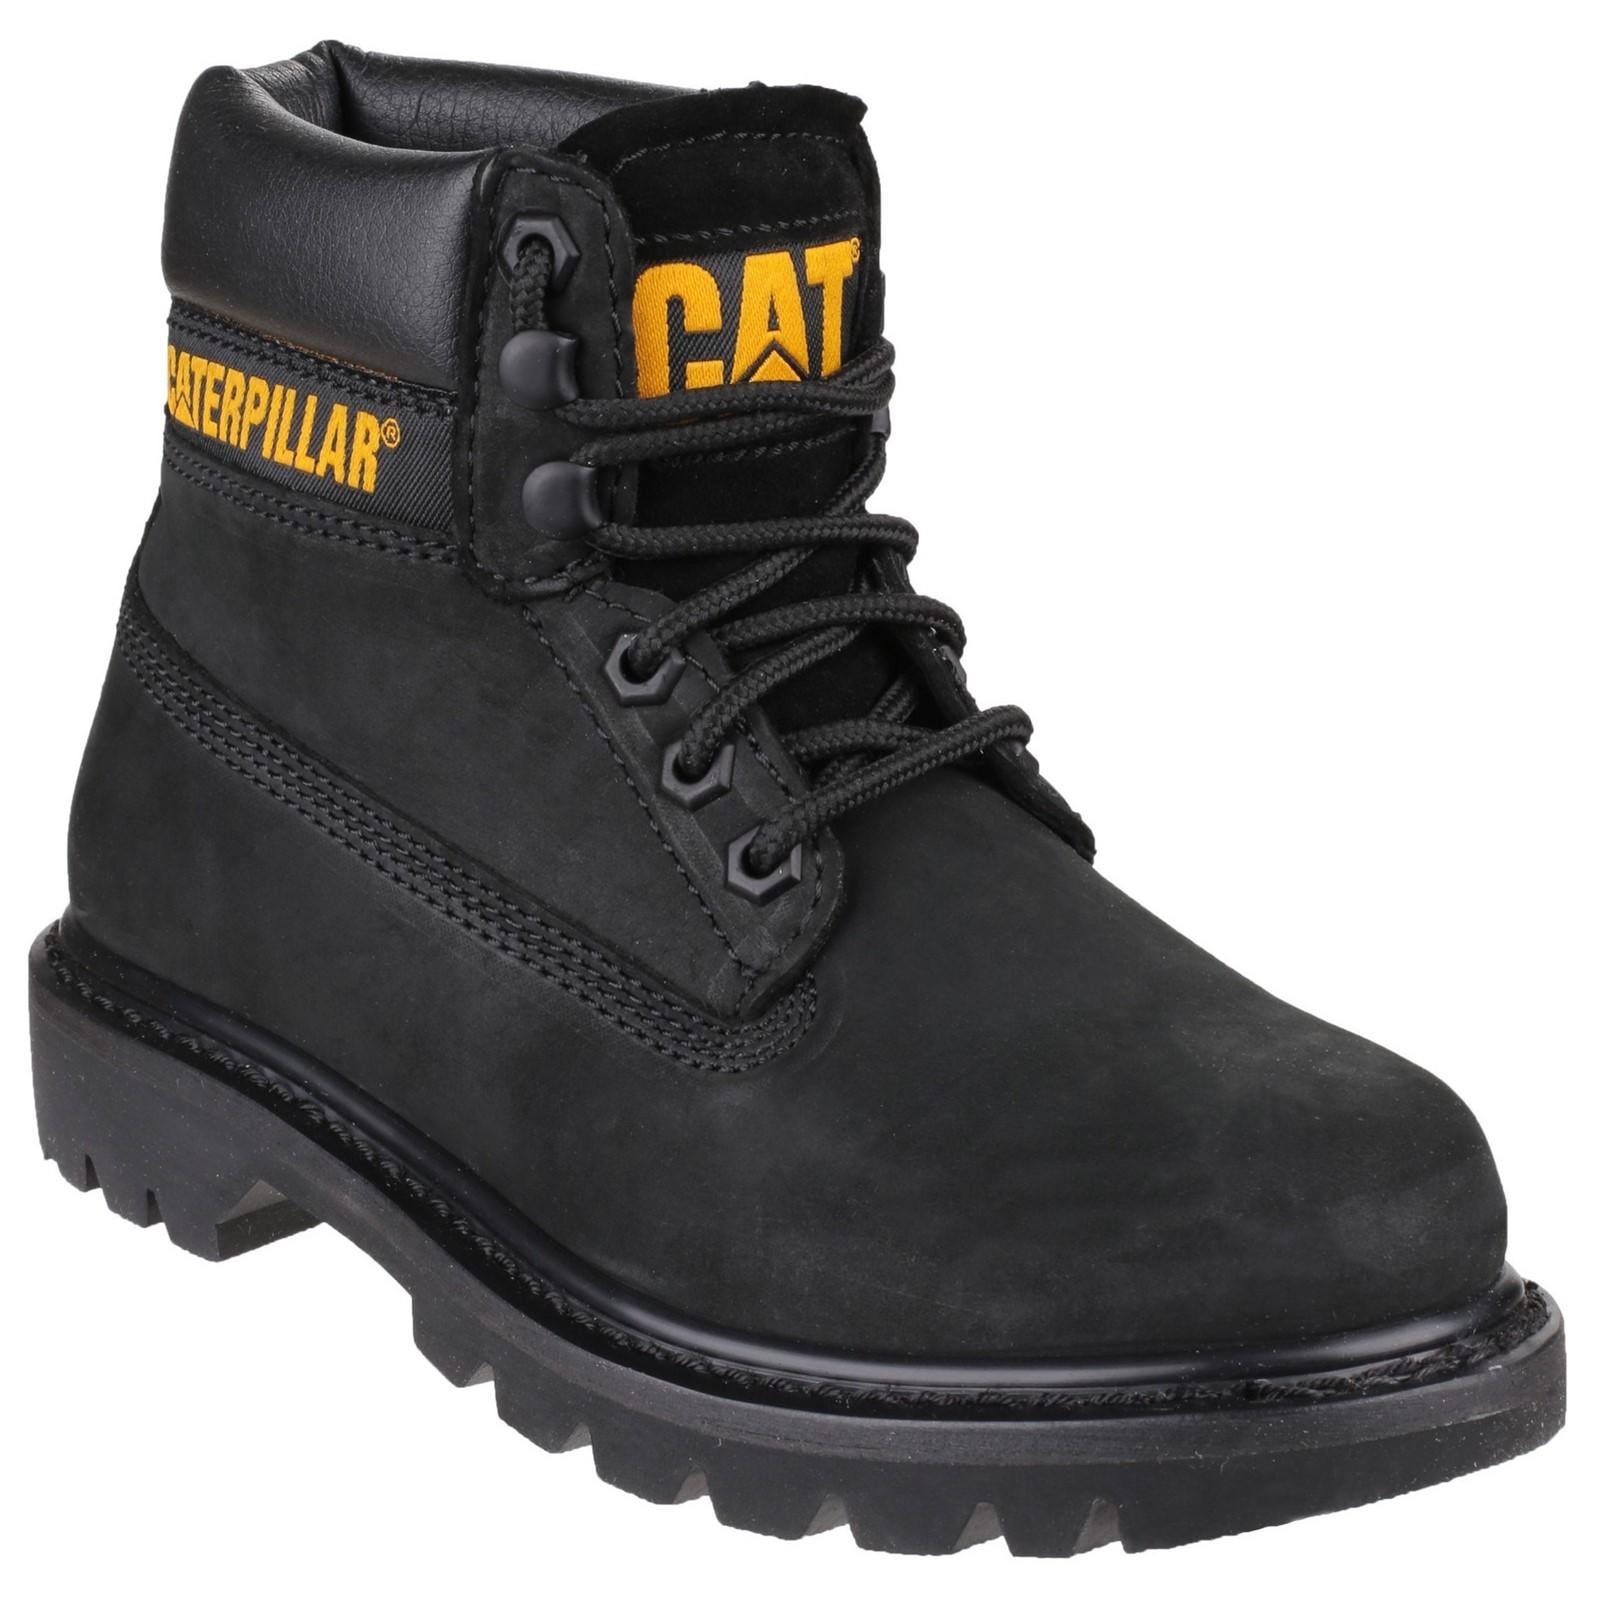 CAT Lifestyle Womens/Ladies Colorado Lace Up Ankle Boots (6 UK) (Black)